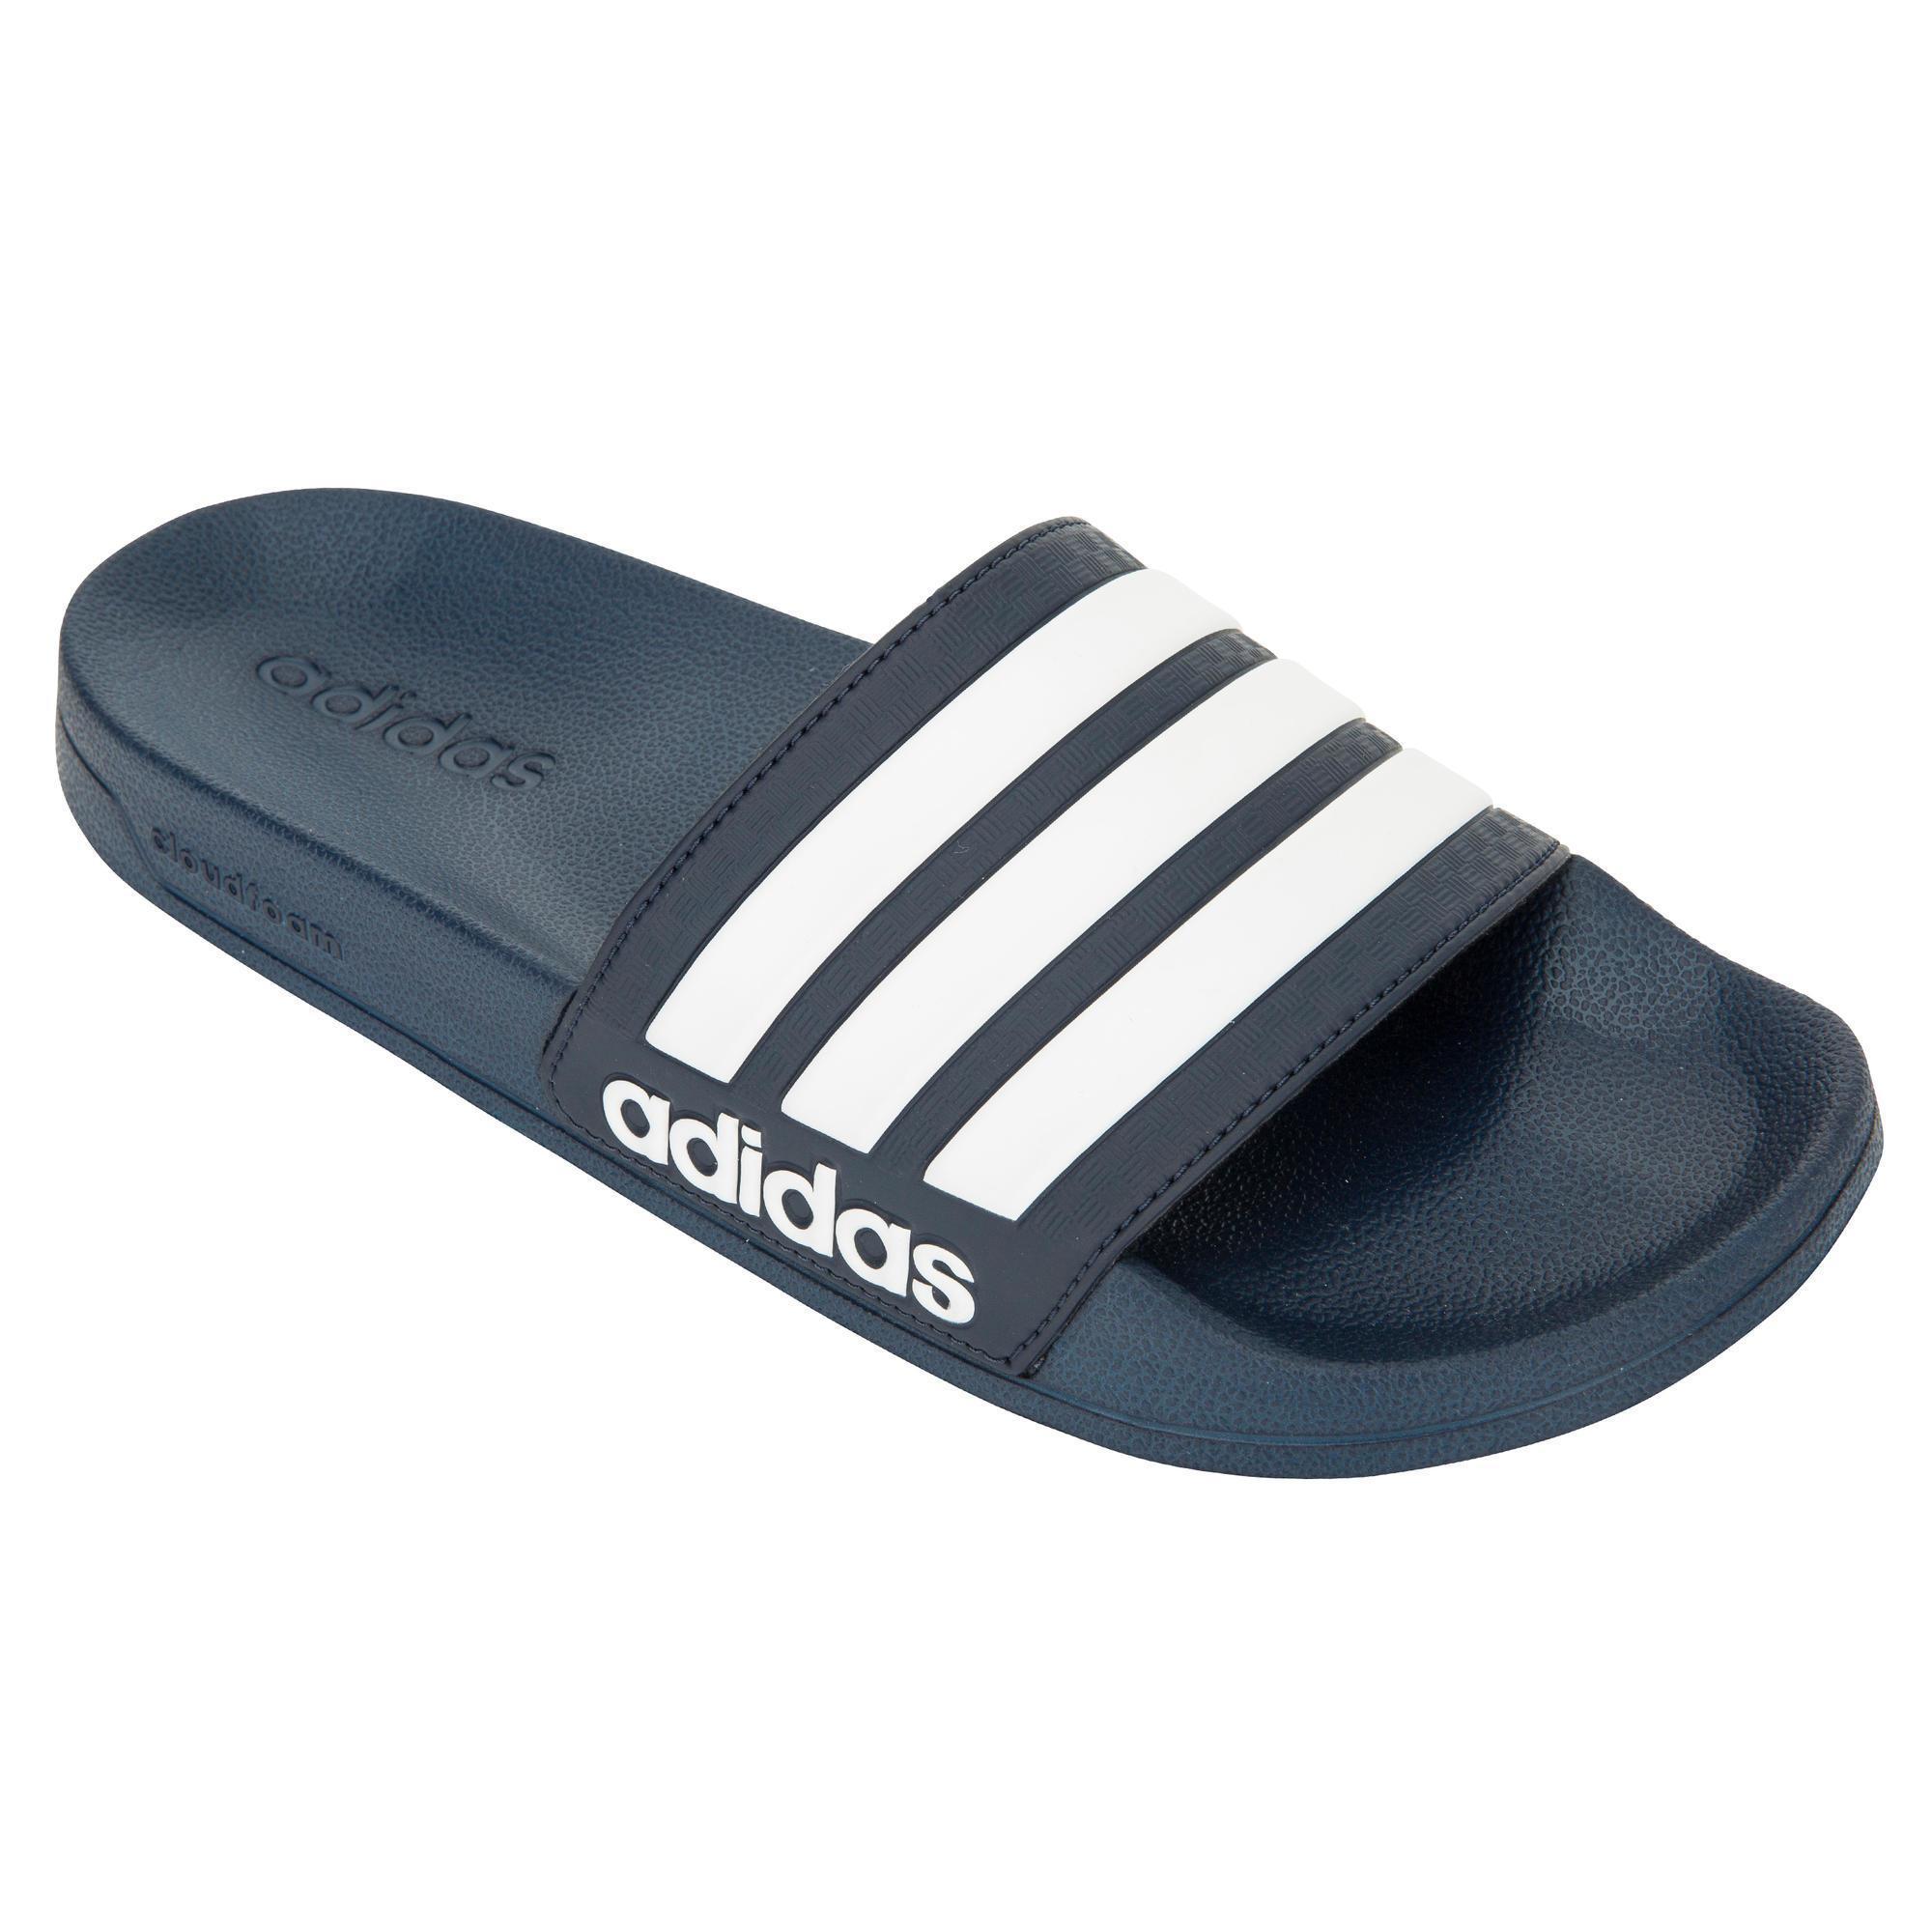 bb367f9d9c28f adidas cloudfoam slippers zwart